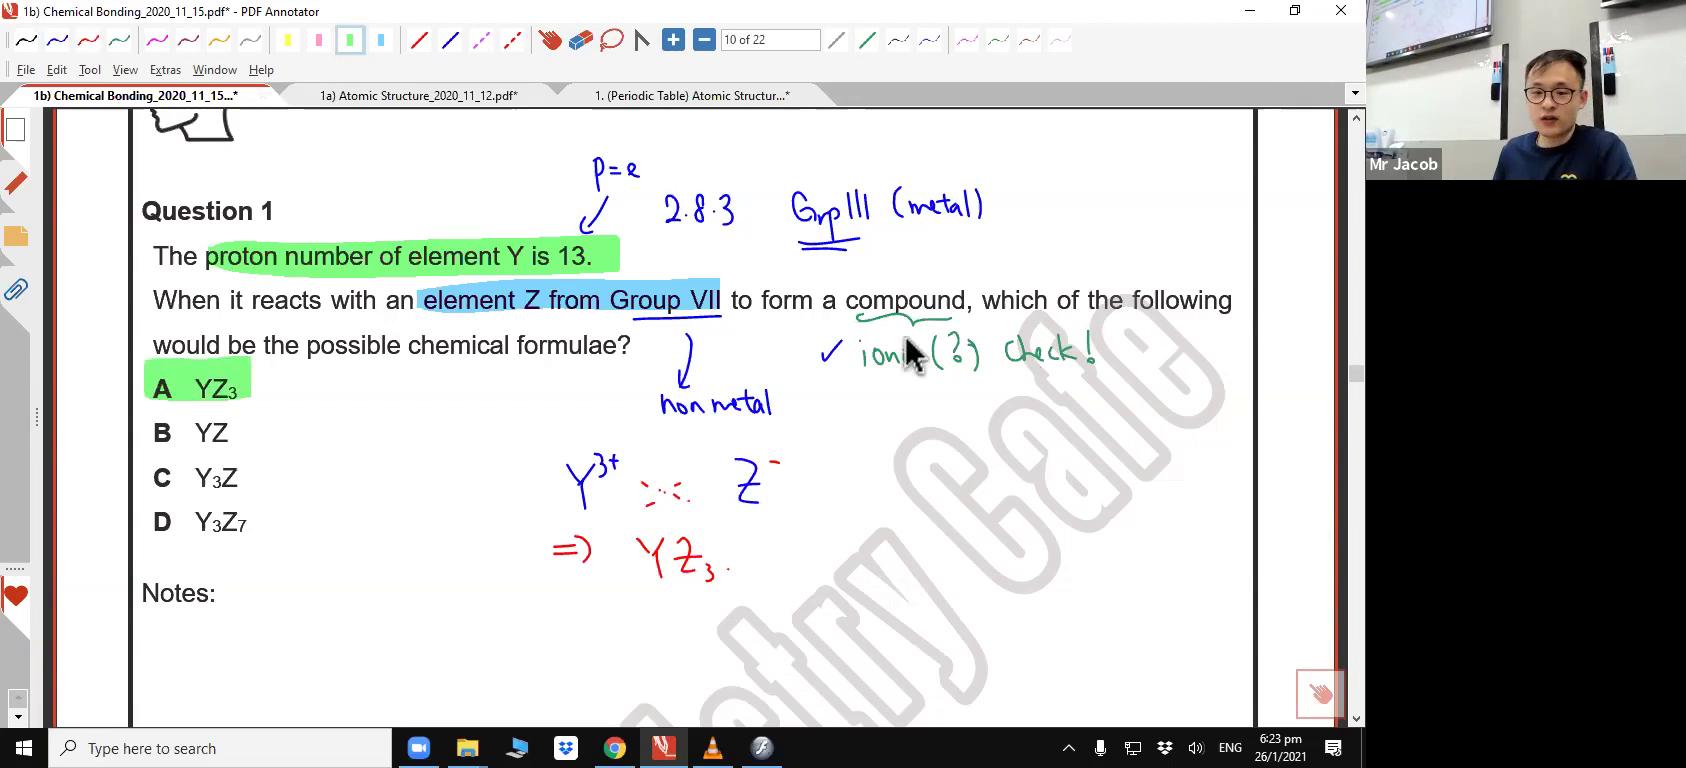 [CHEMICAL BONDING] Ionic Bonding & Chemical Formulae